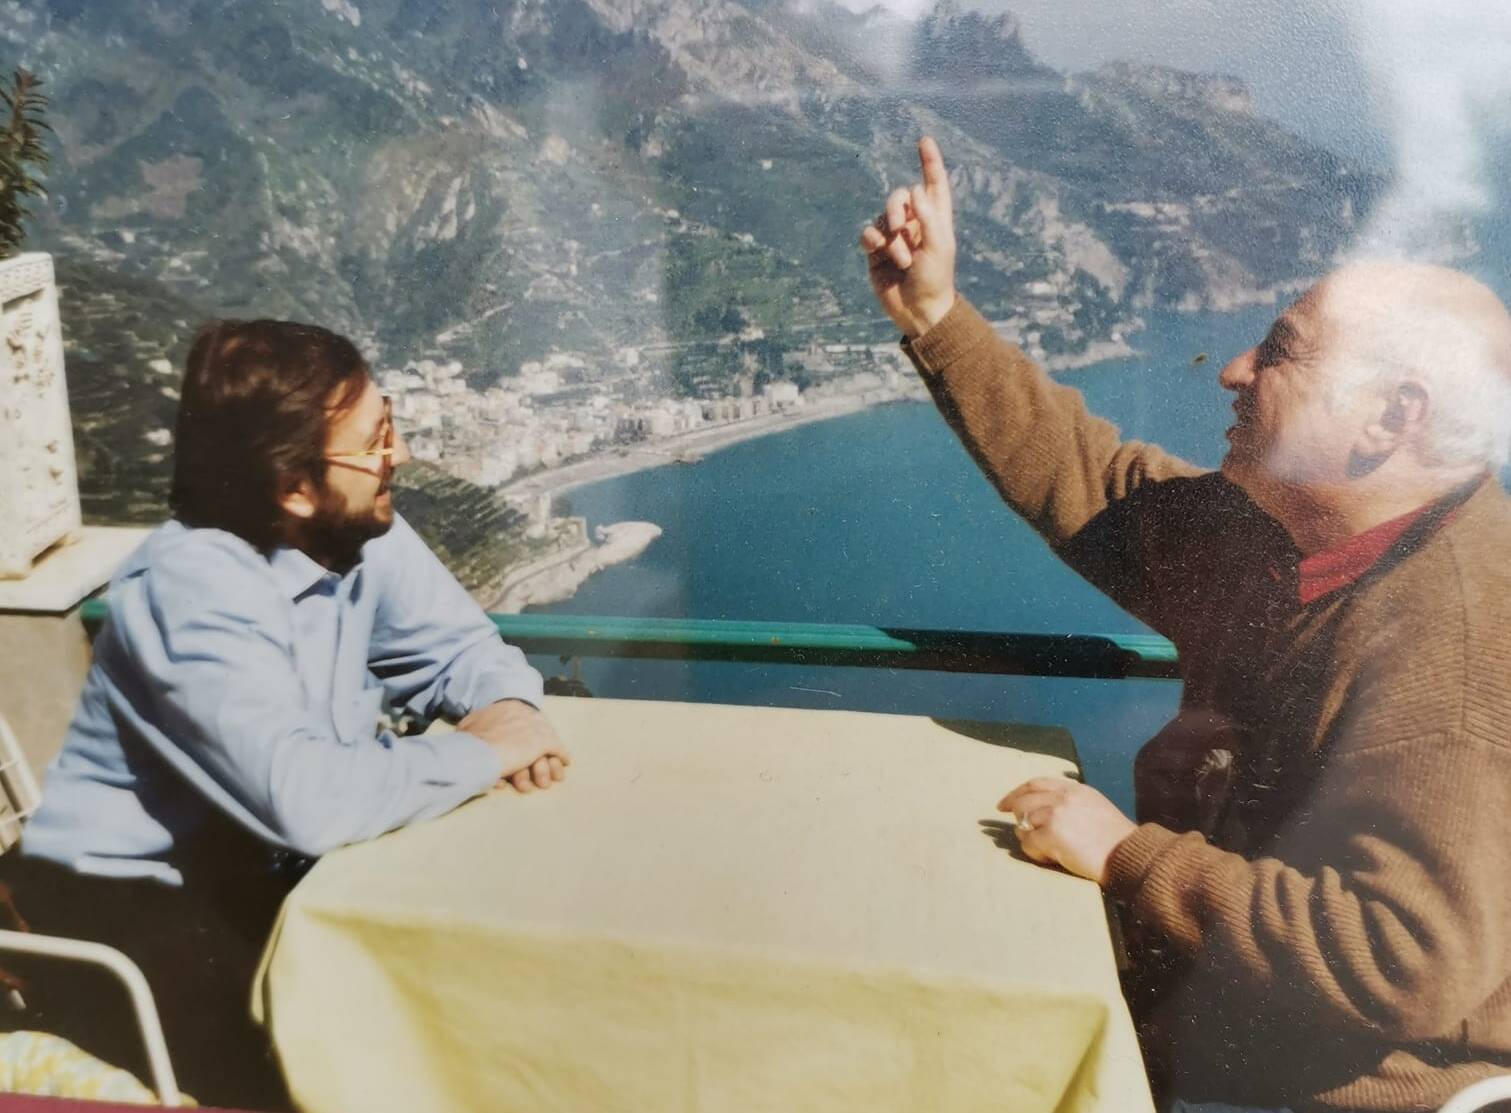 Oscar Nicolaus: Edgar Morin mi ha cambiato la vita